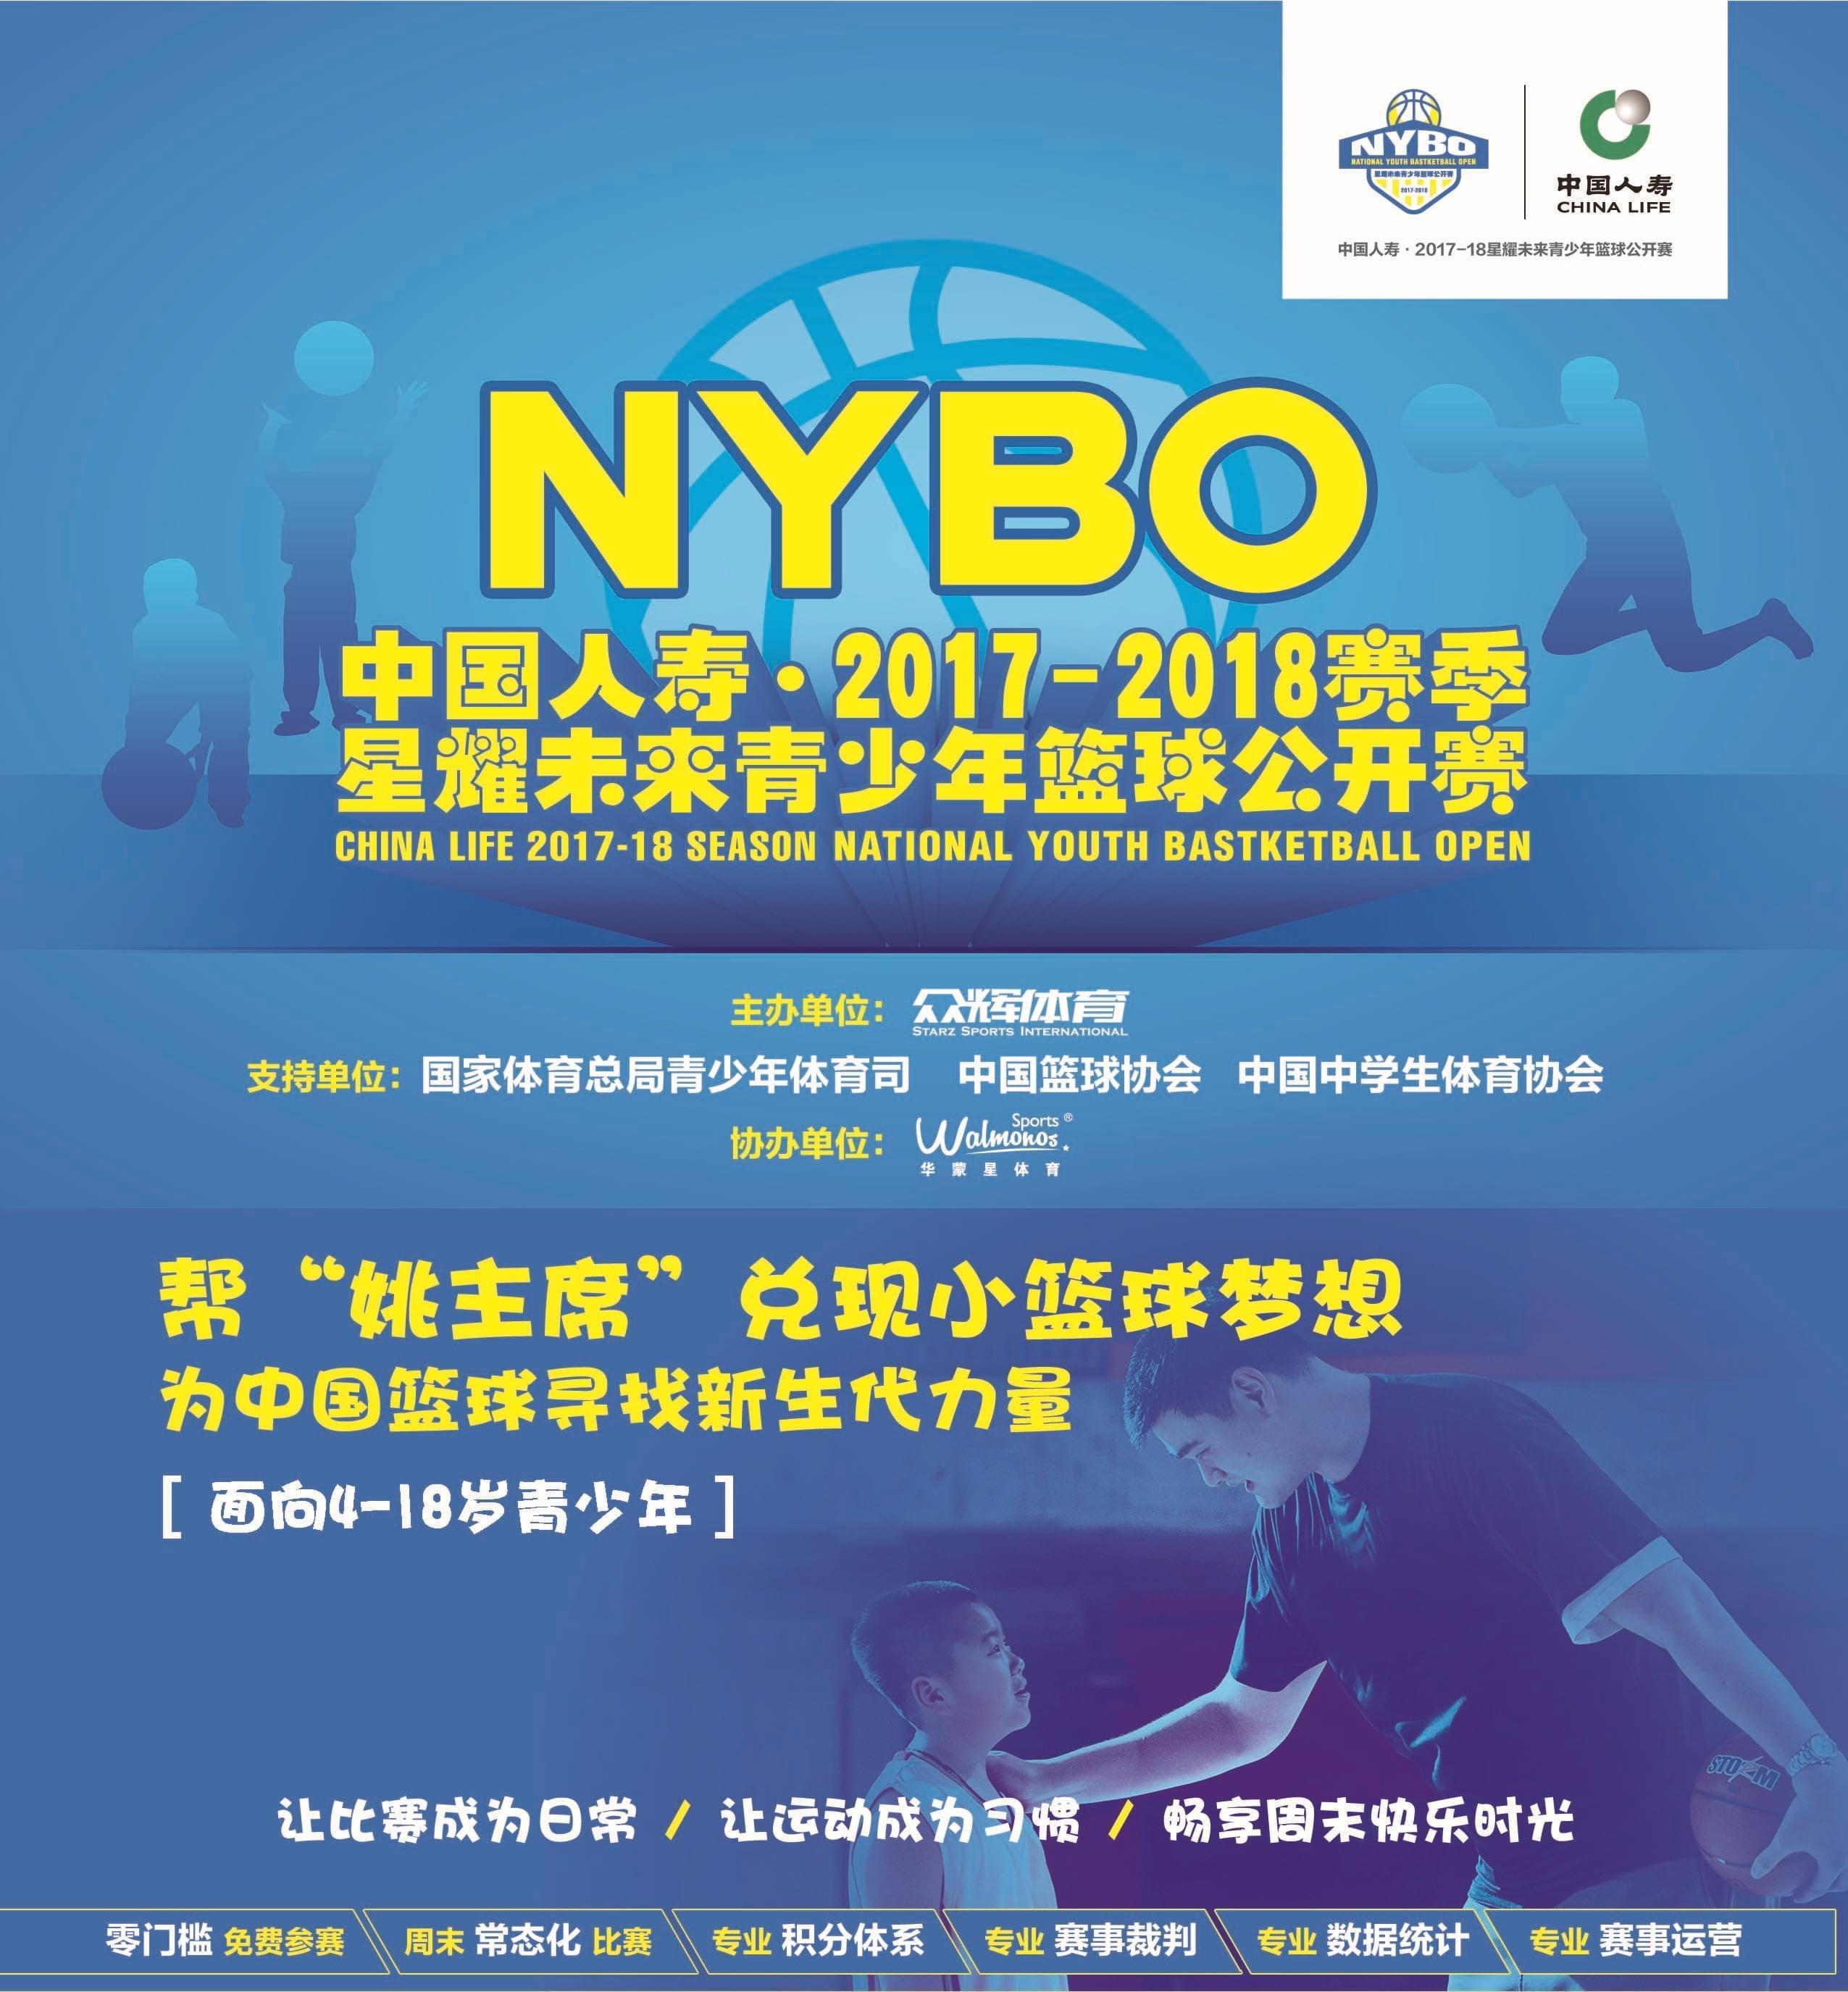 NYBO联赛火热报名中 姚明希望未来的国手从这里起飞!